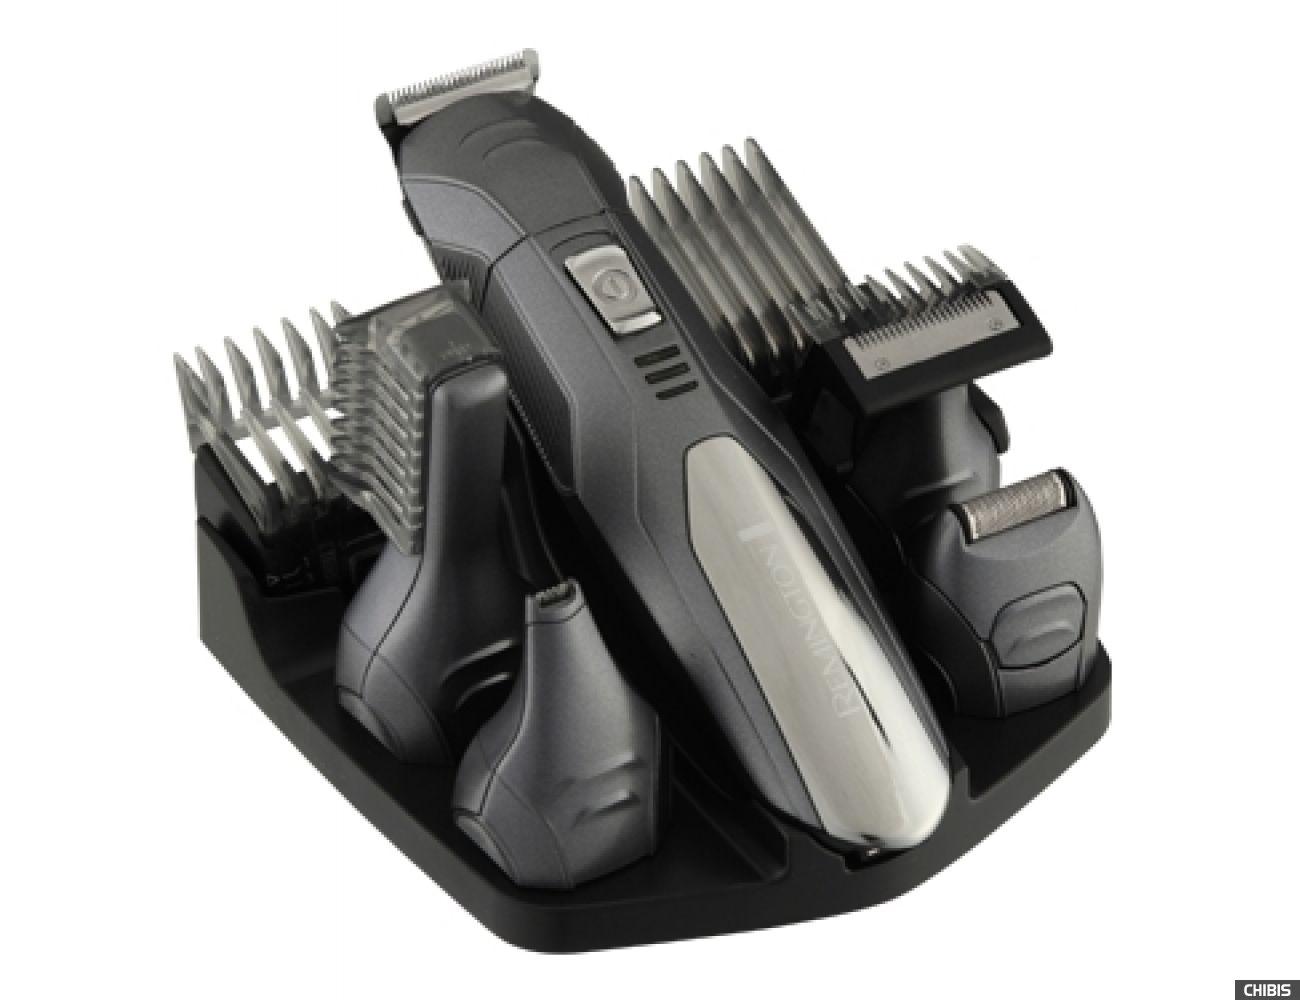 Комплект по уходу за волосами Remington PG6050 E51 (43142560400)